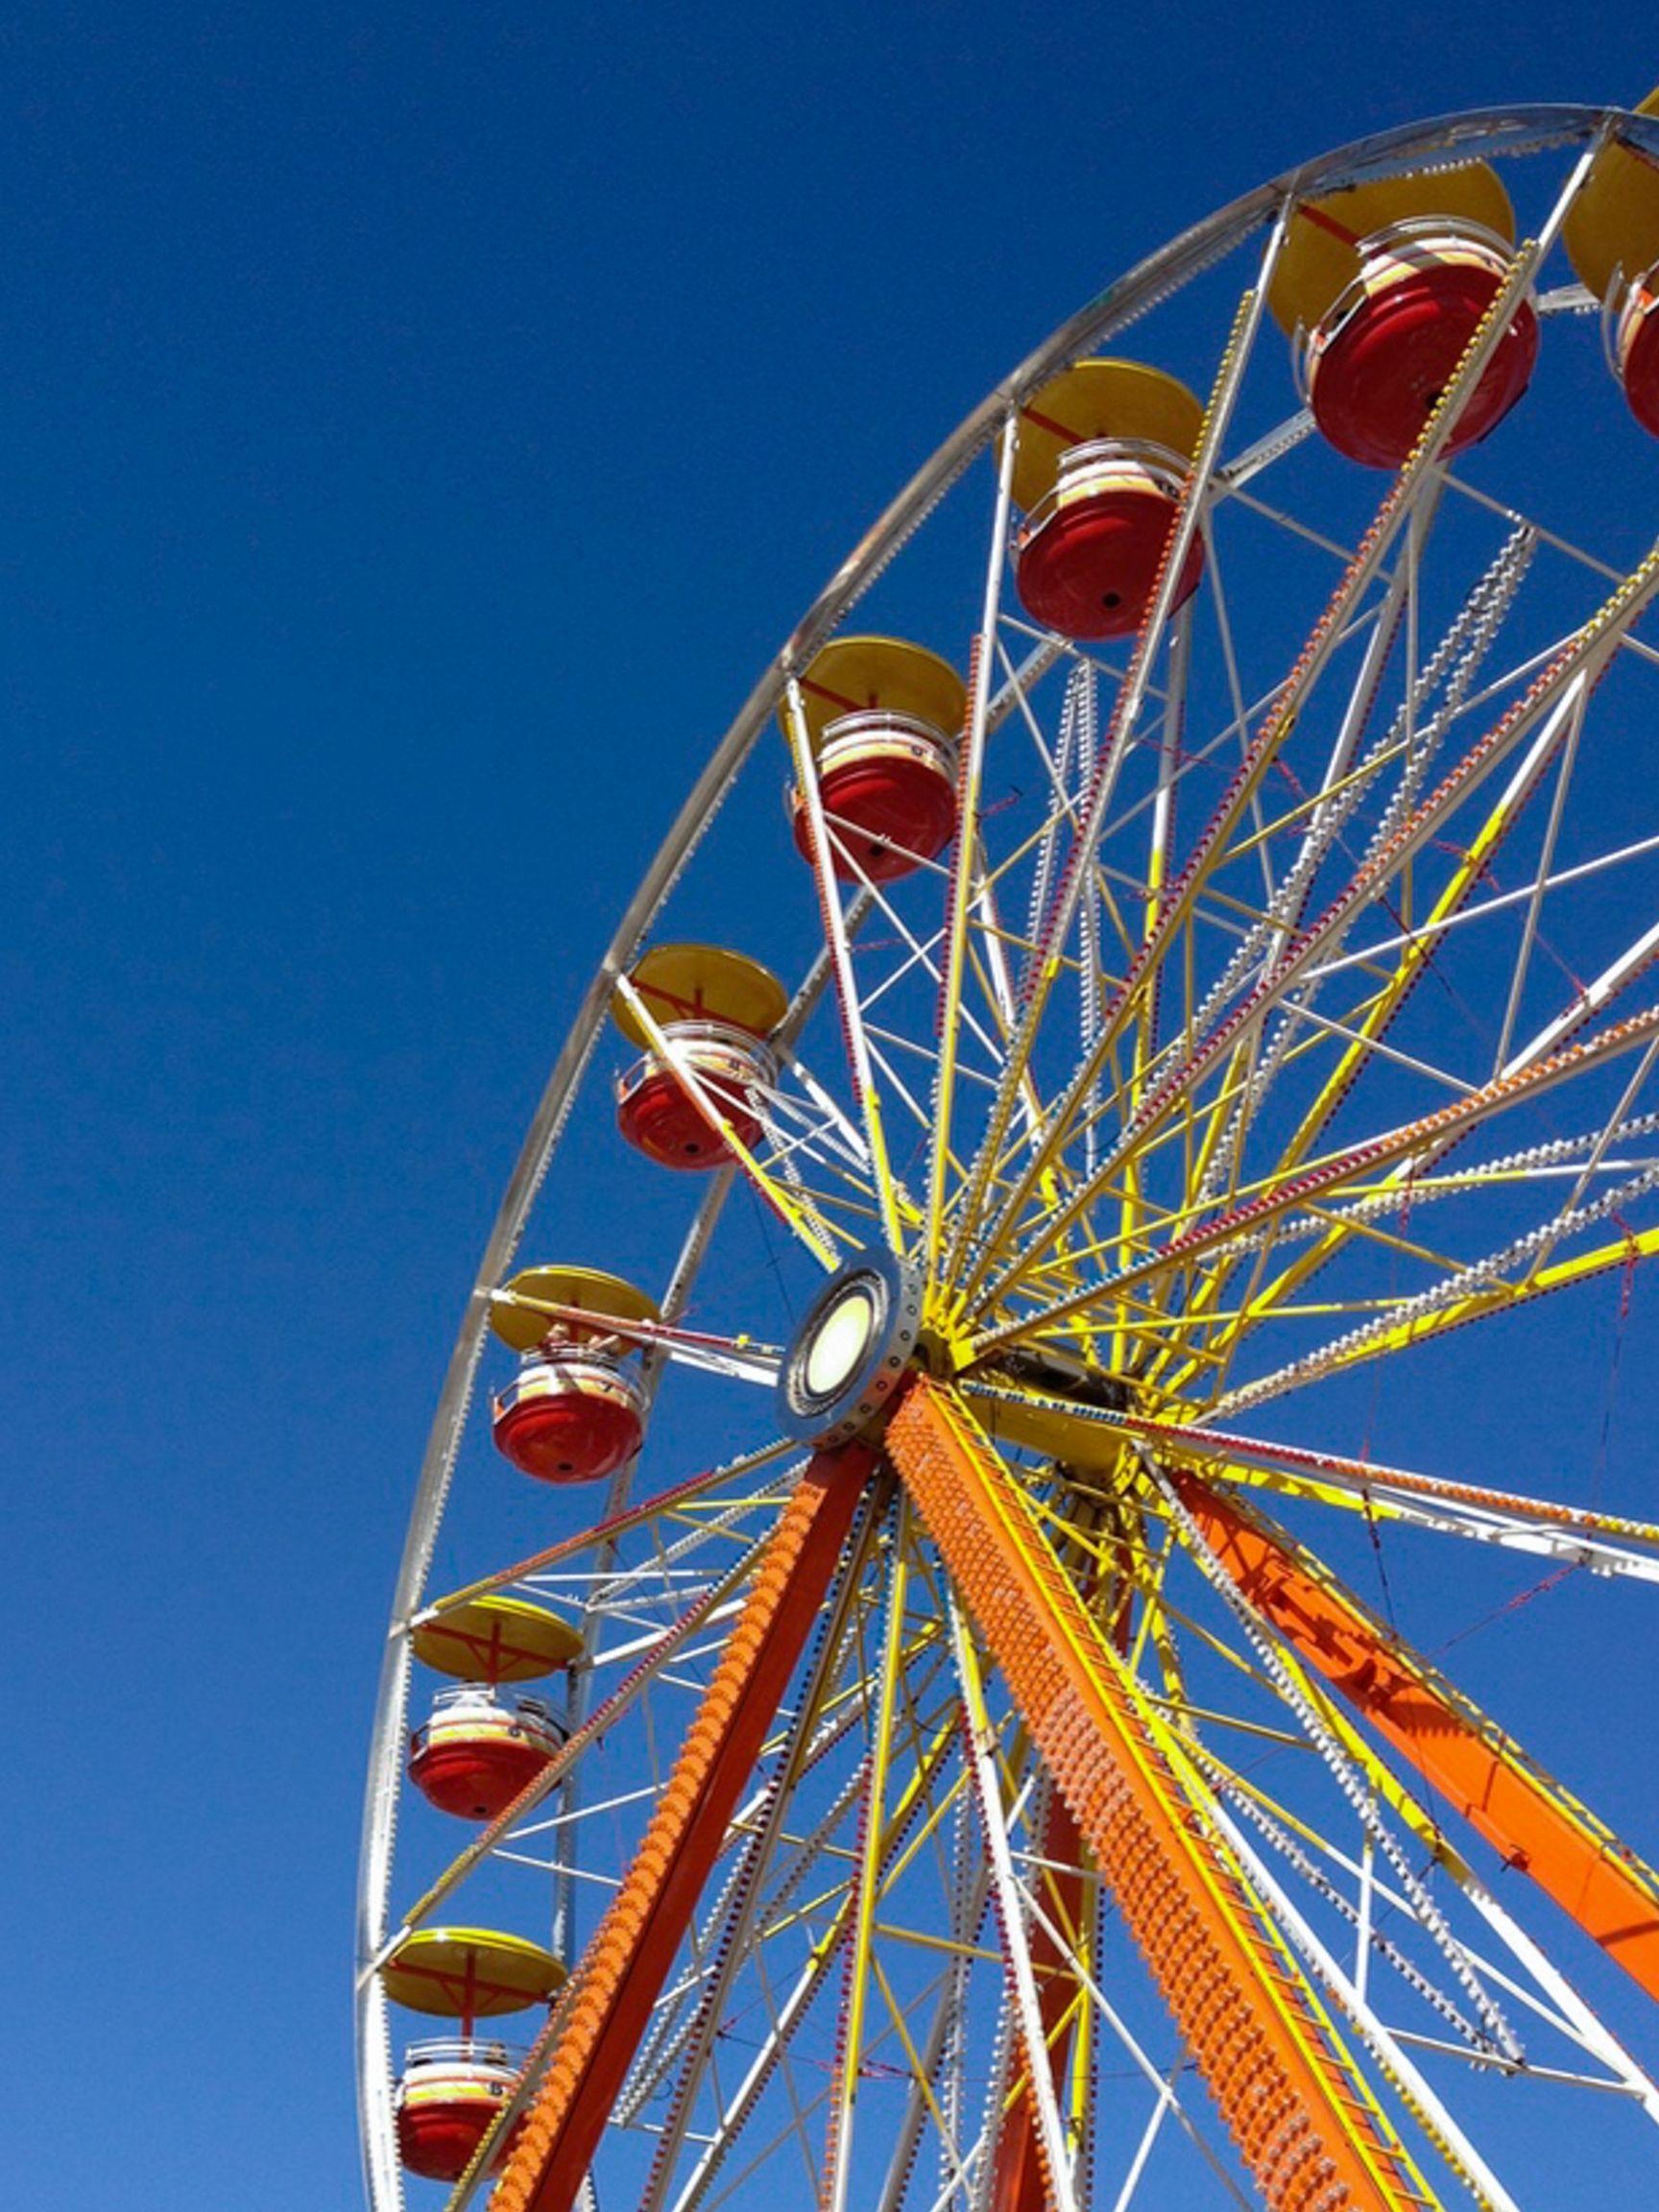 A Ferris wheel at the North Carolina State Fair in Raleigh